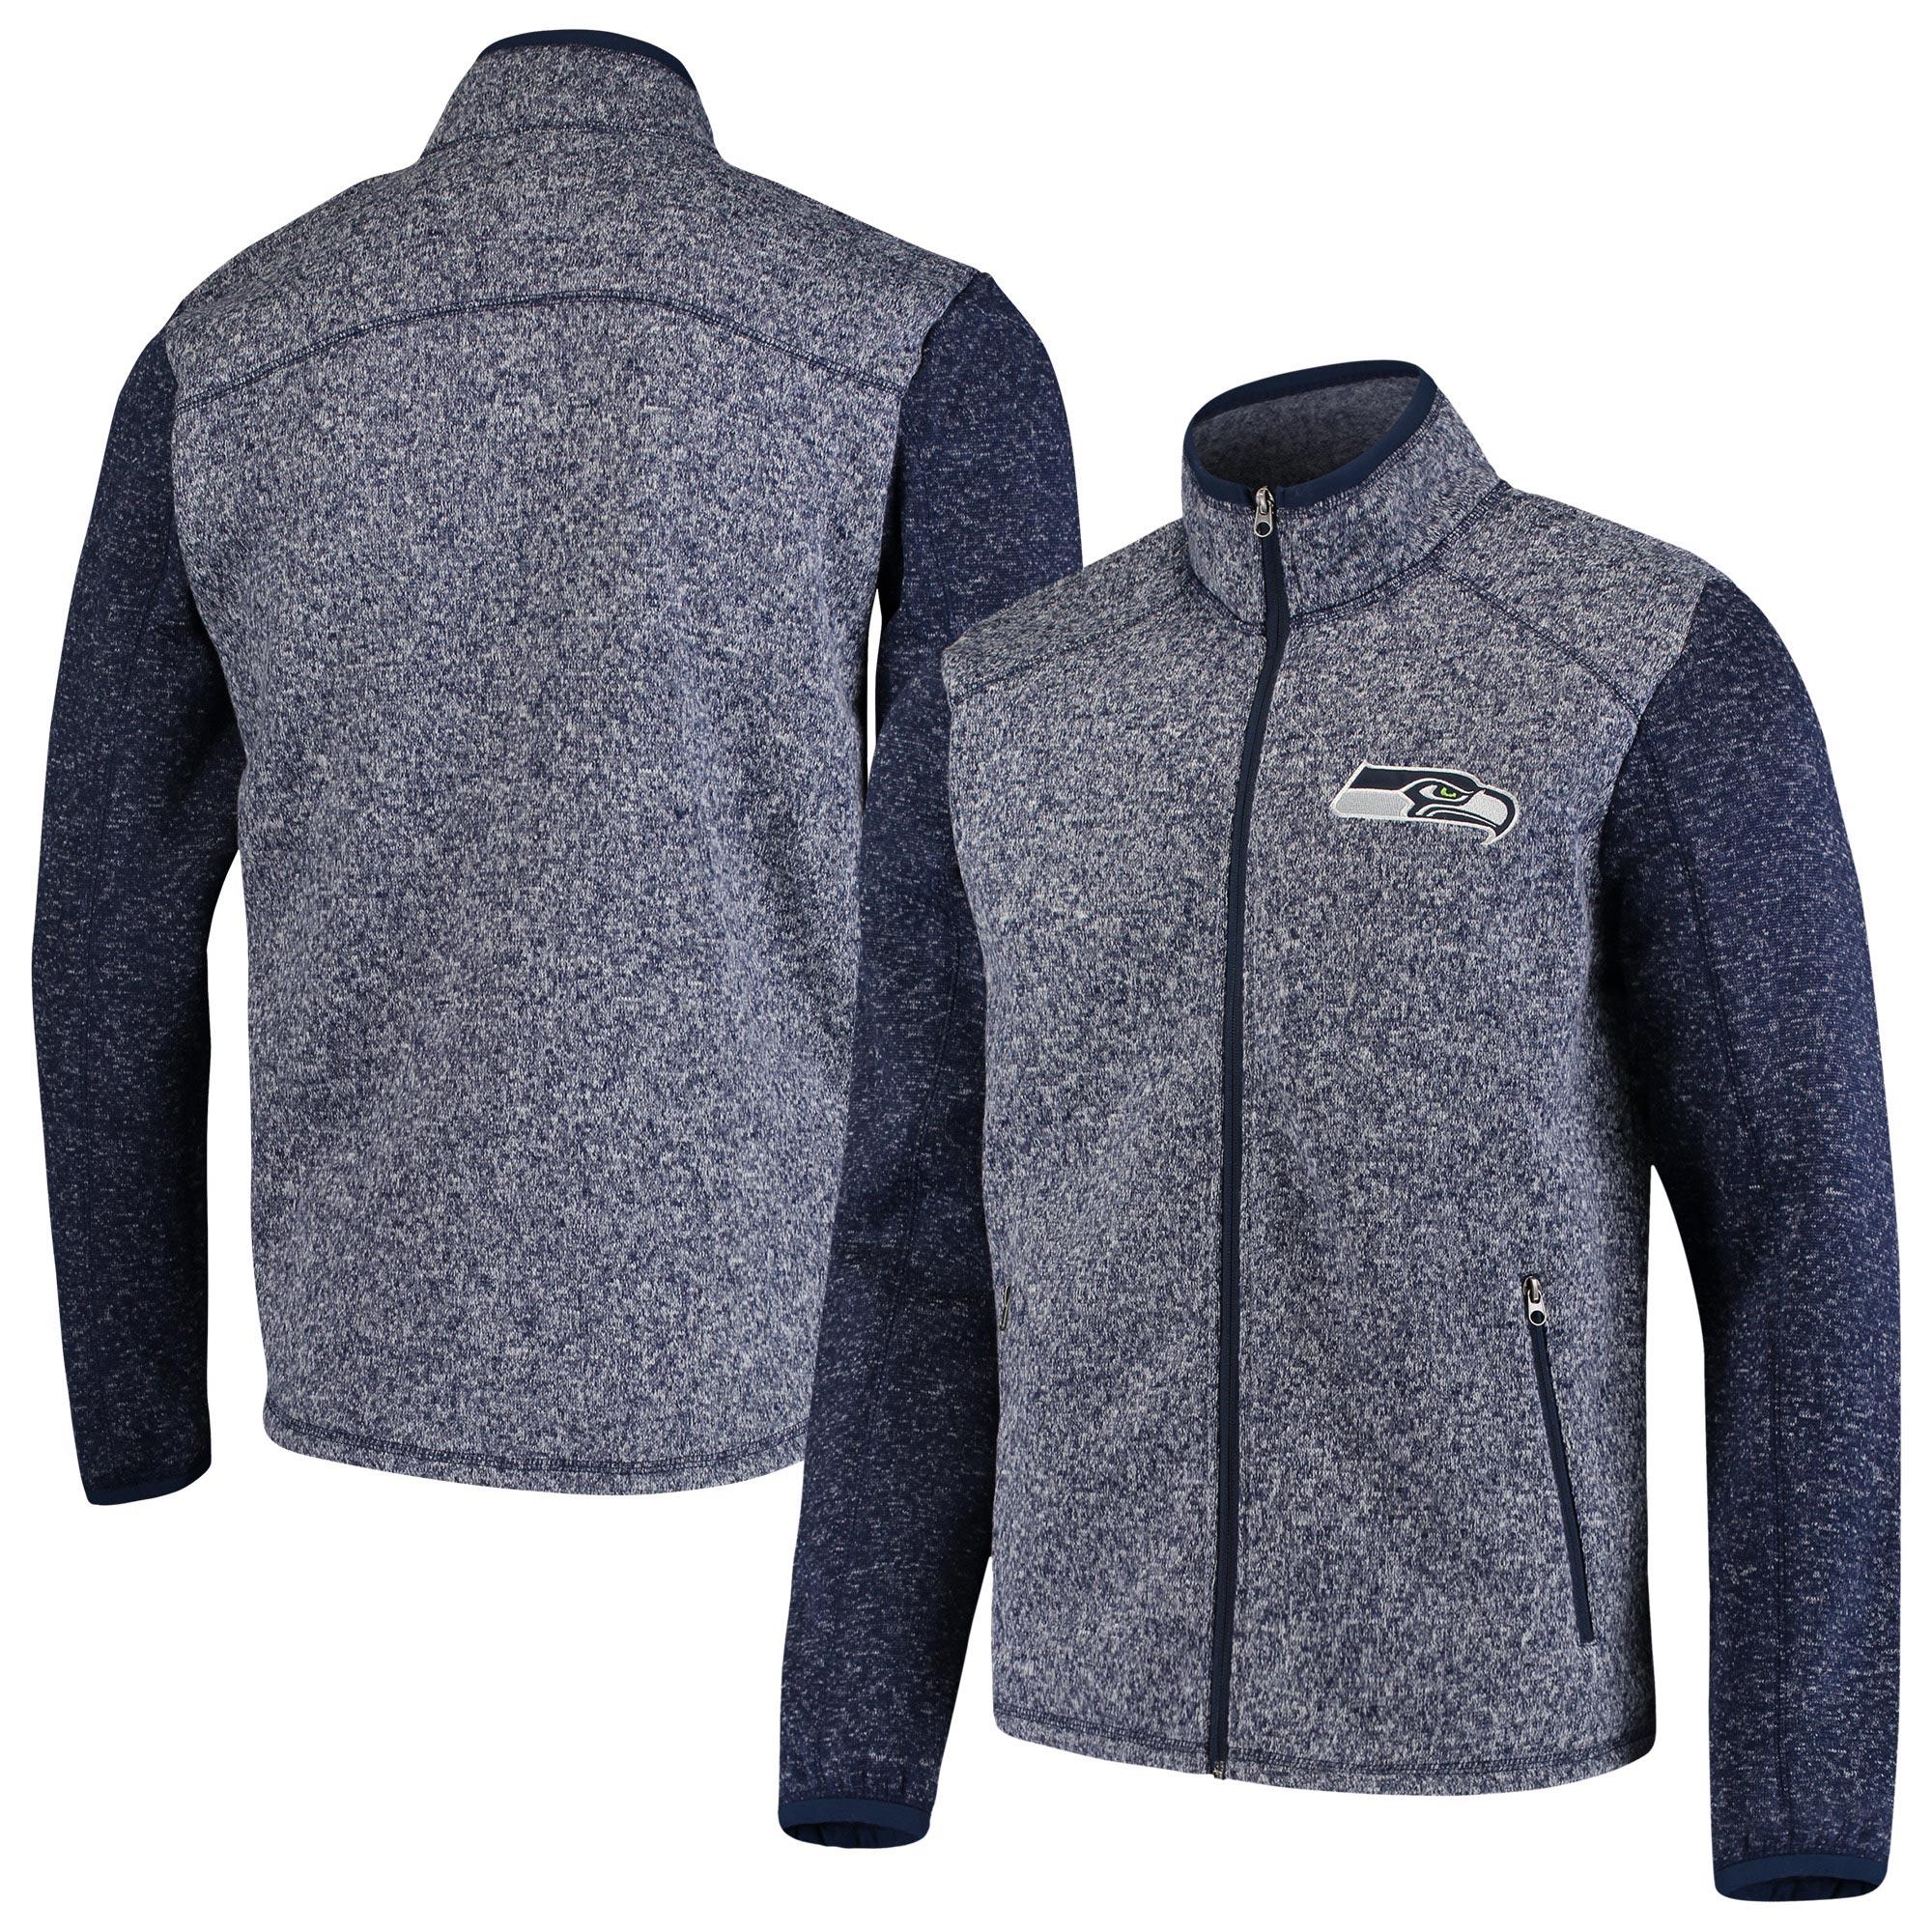 Seattle Seahawks G-III Sports by Carl Banks Alpine Zone Sweater Fleece Full-Zip Jacket - Heathered College Navy